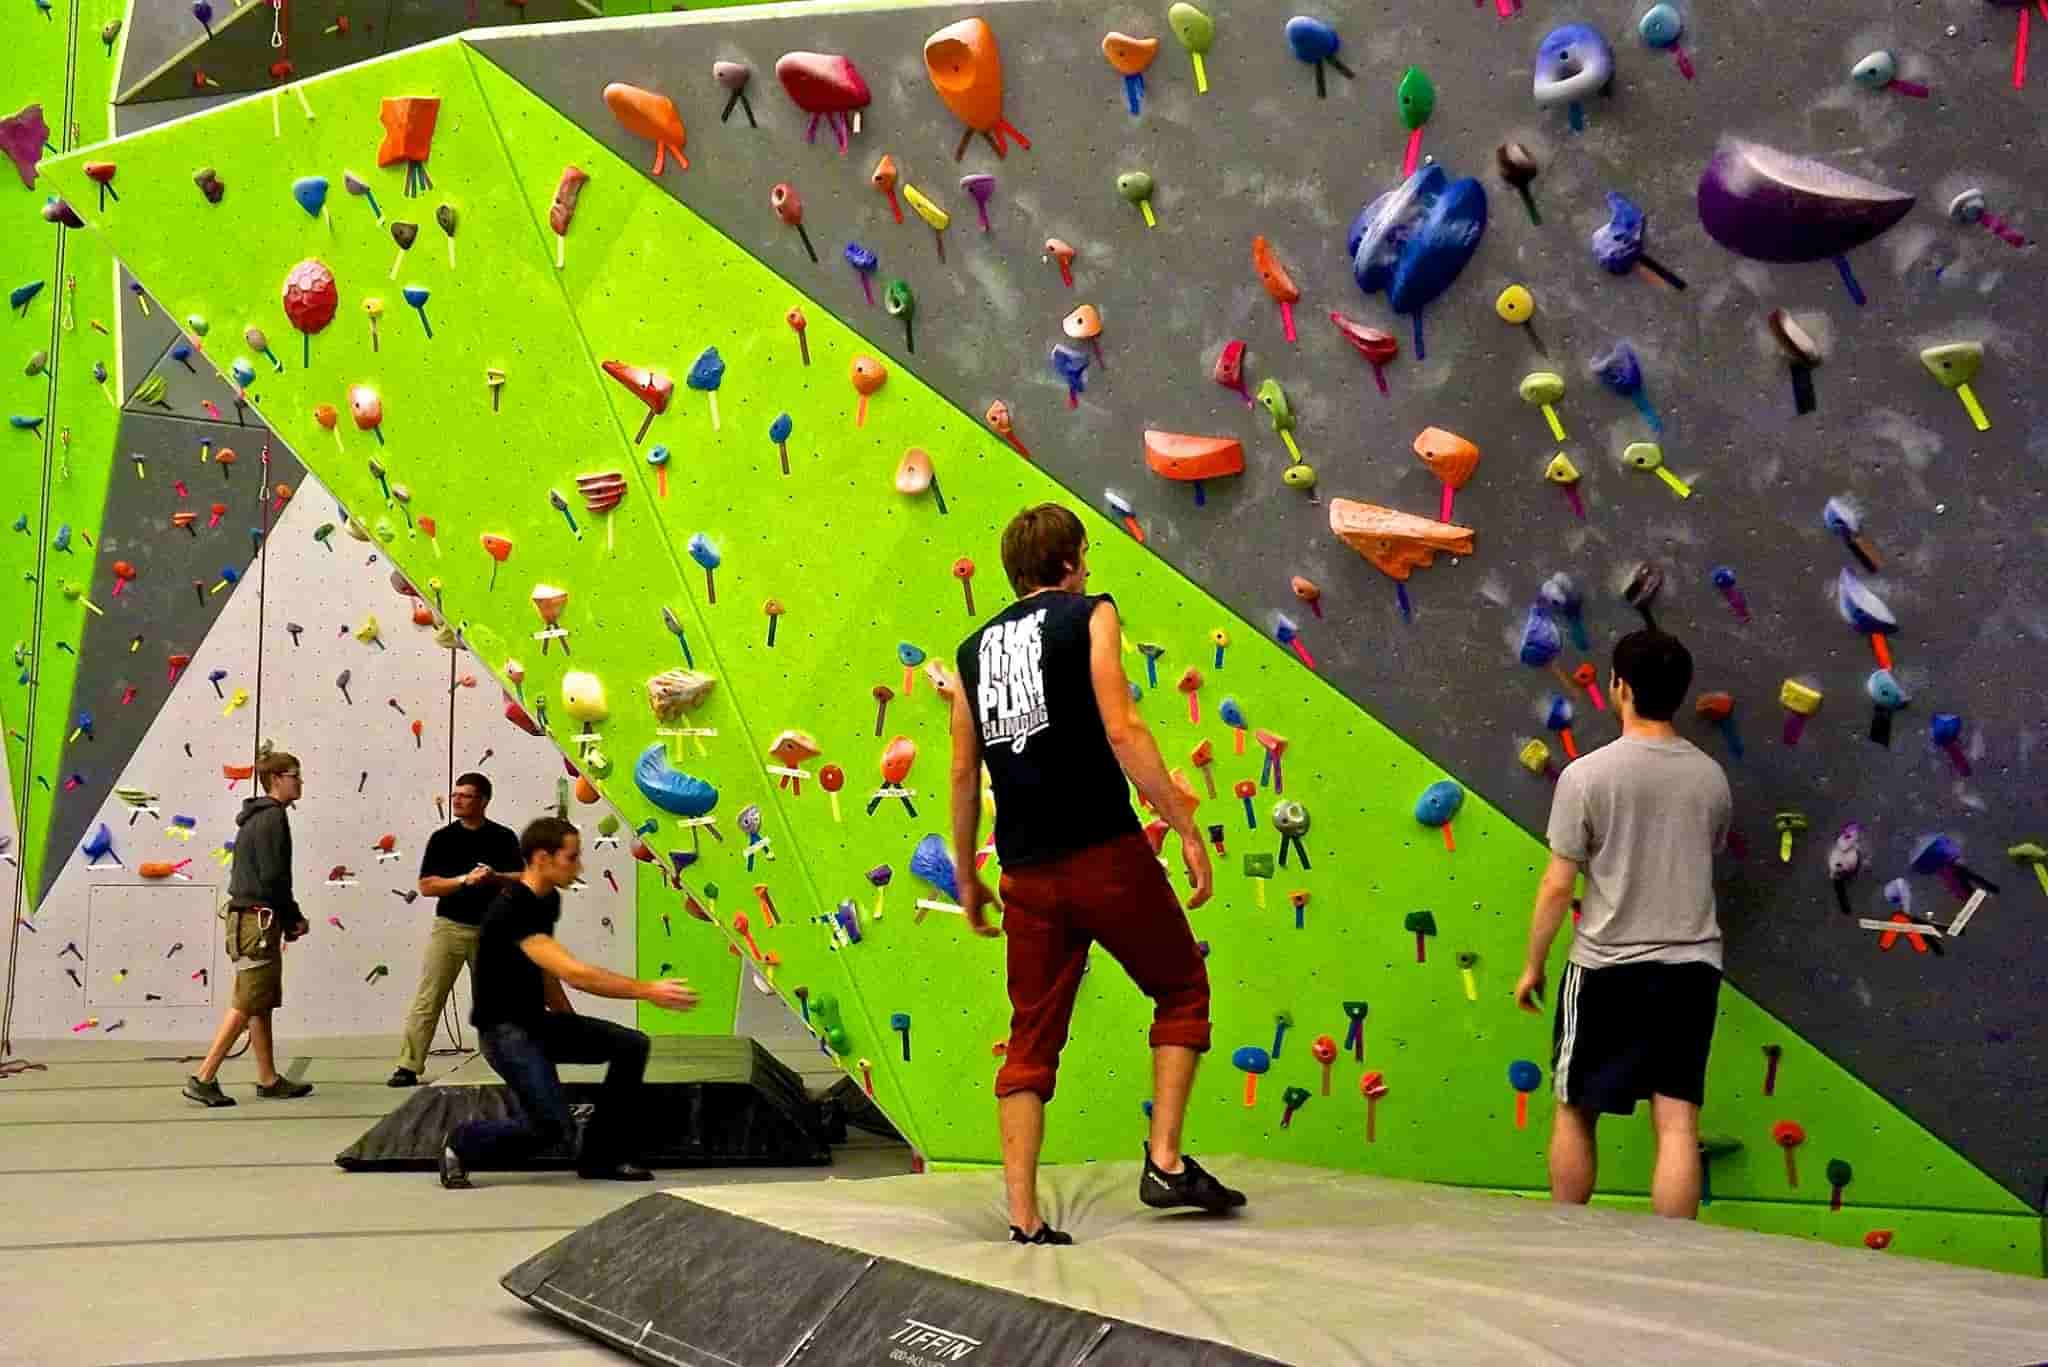 Spooky Nook Sports climbing gym